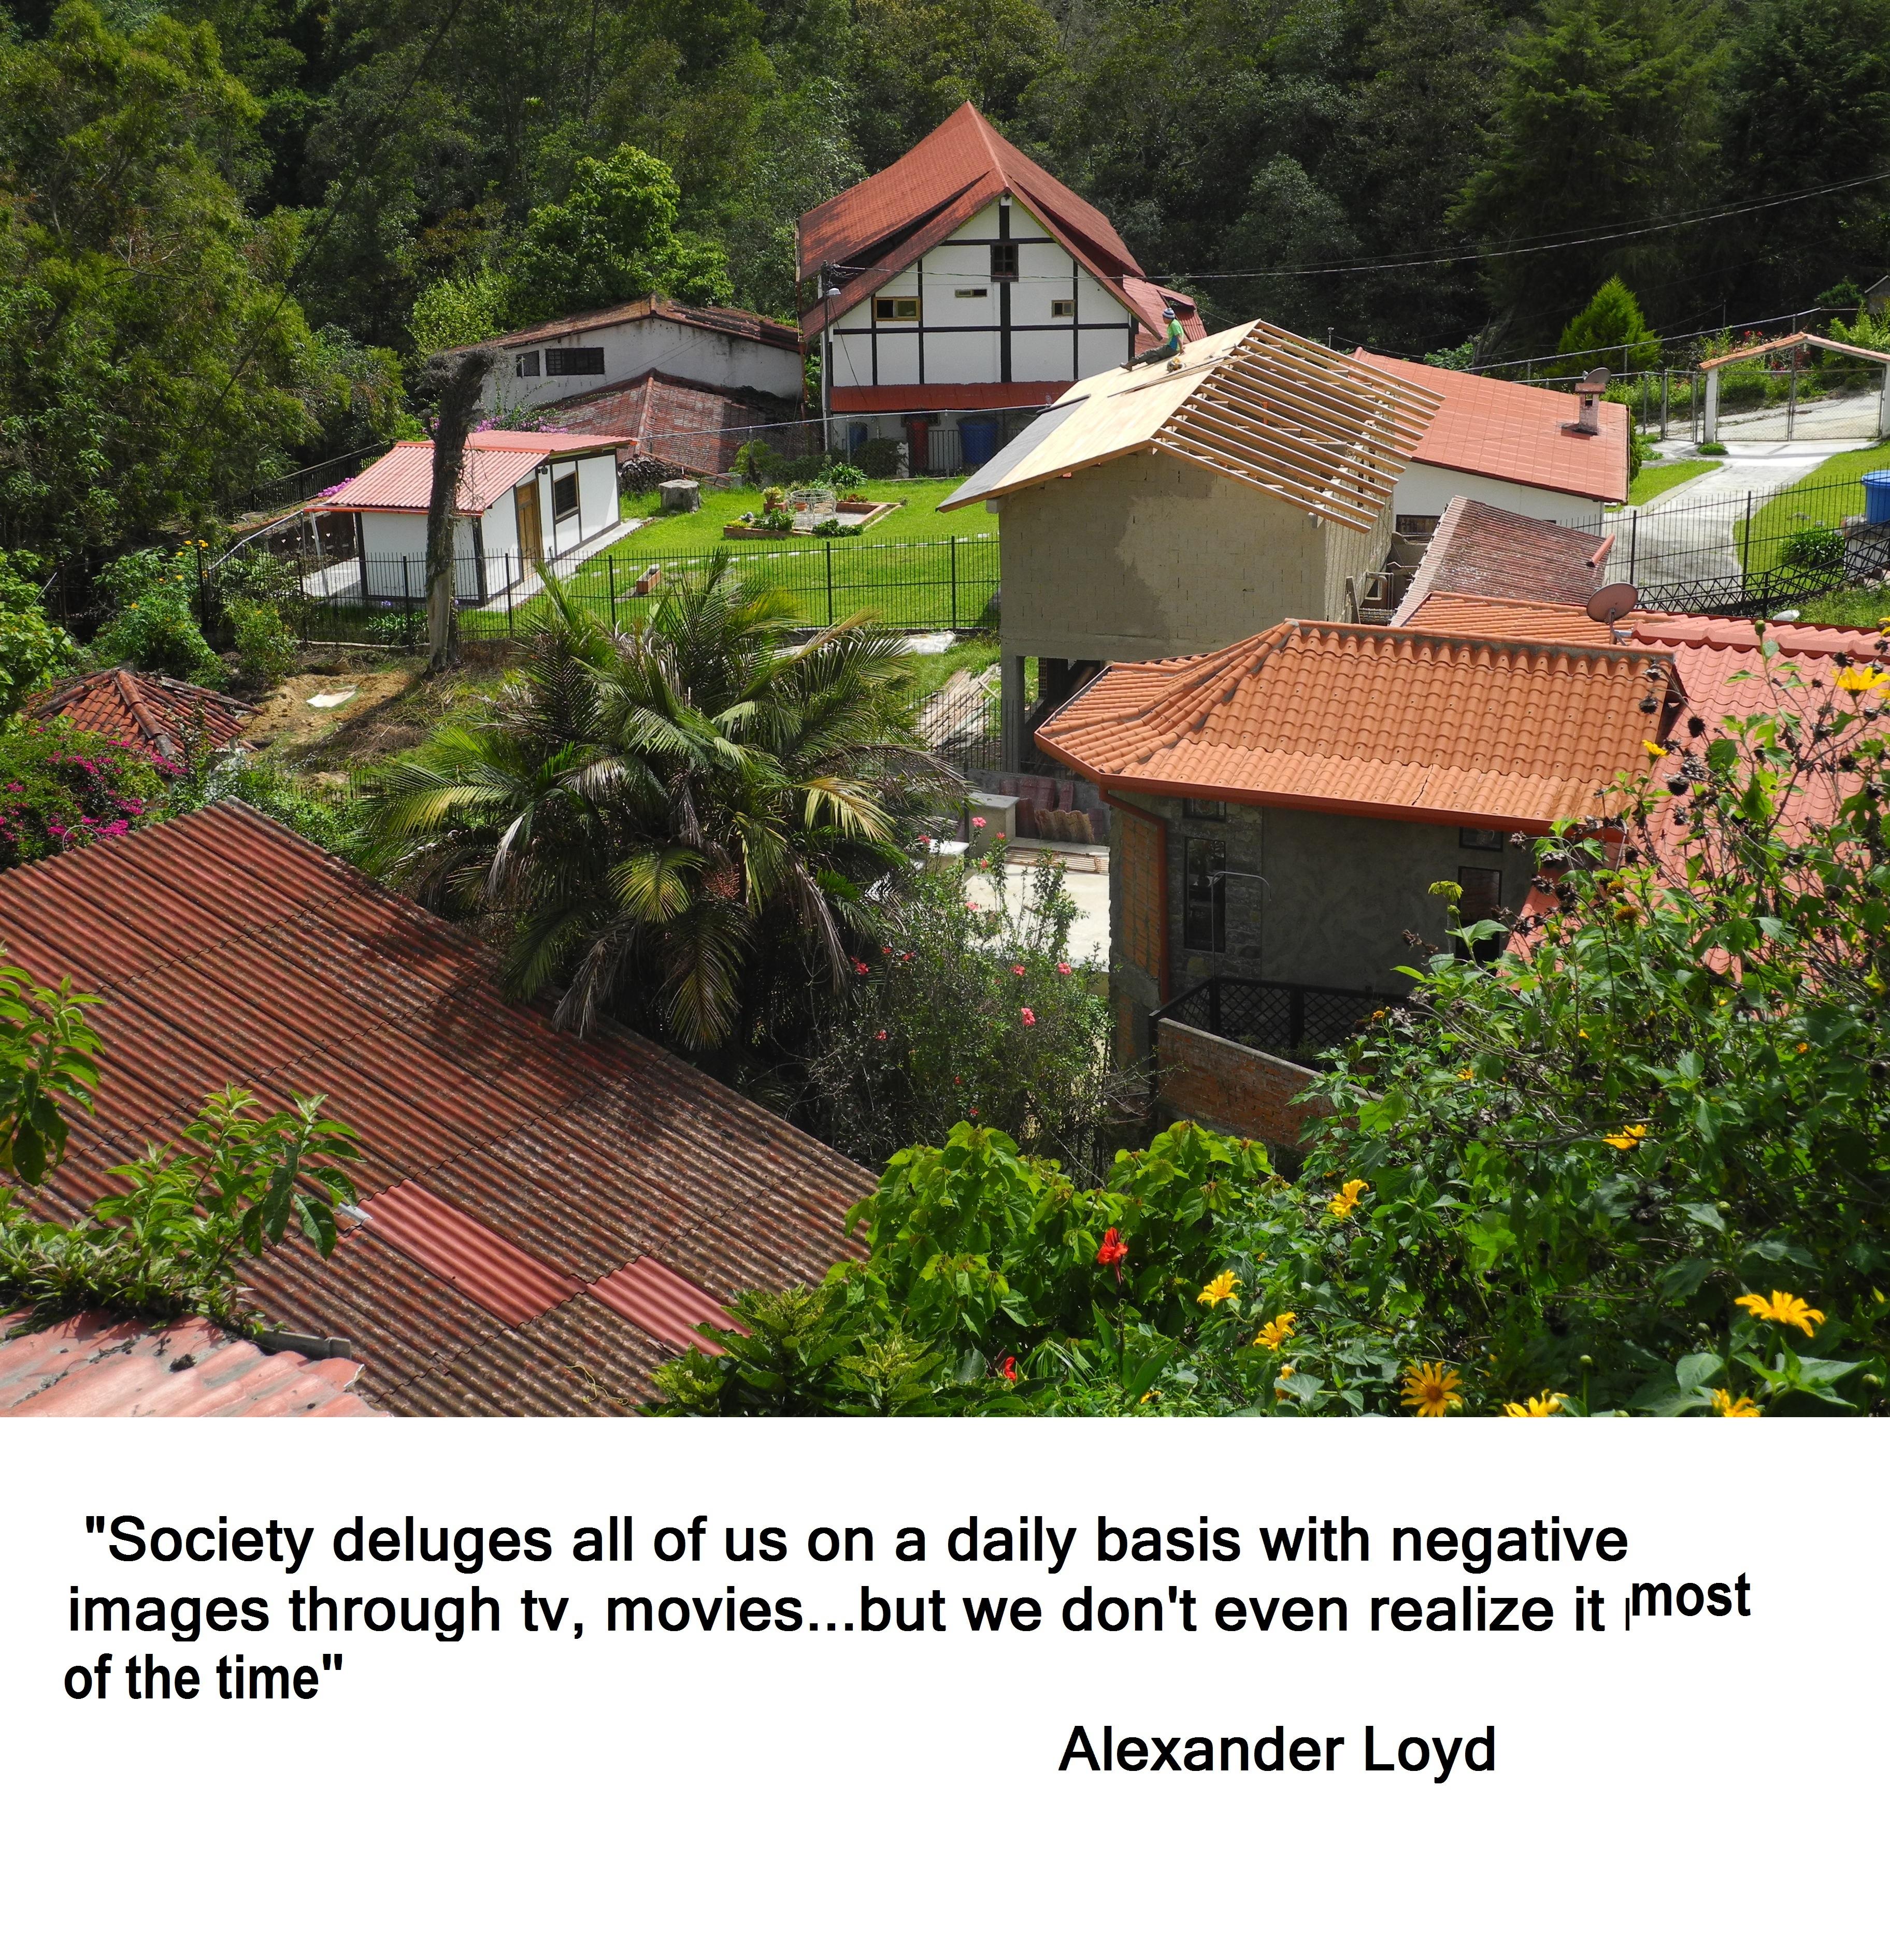 Alexander Loyd